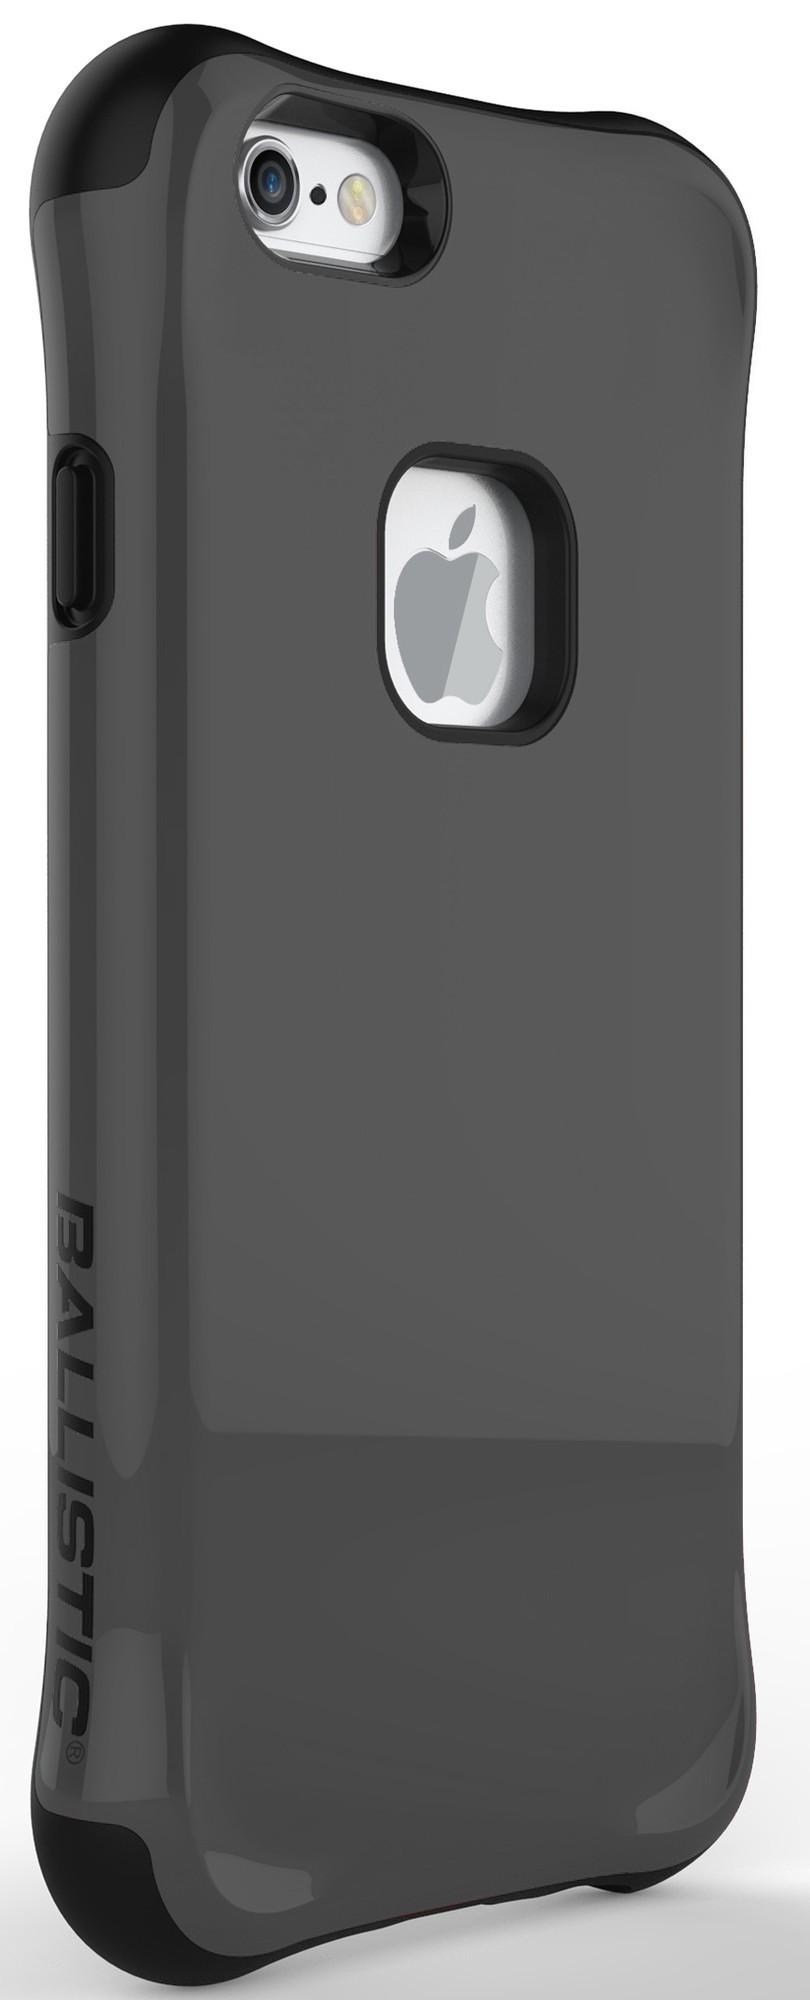 Ballistic Urbanite iPhone 6 / 6S Grey / Black